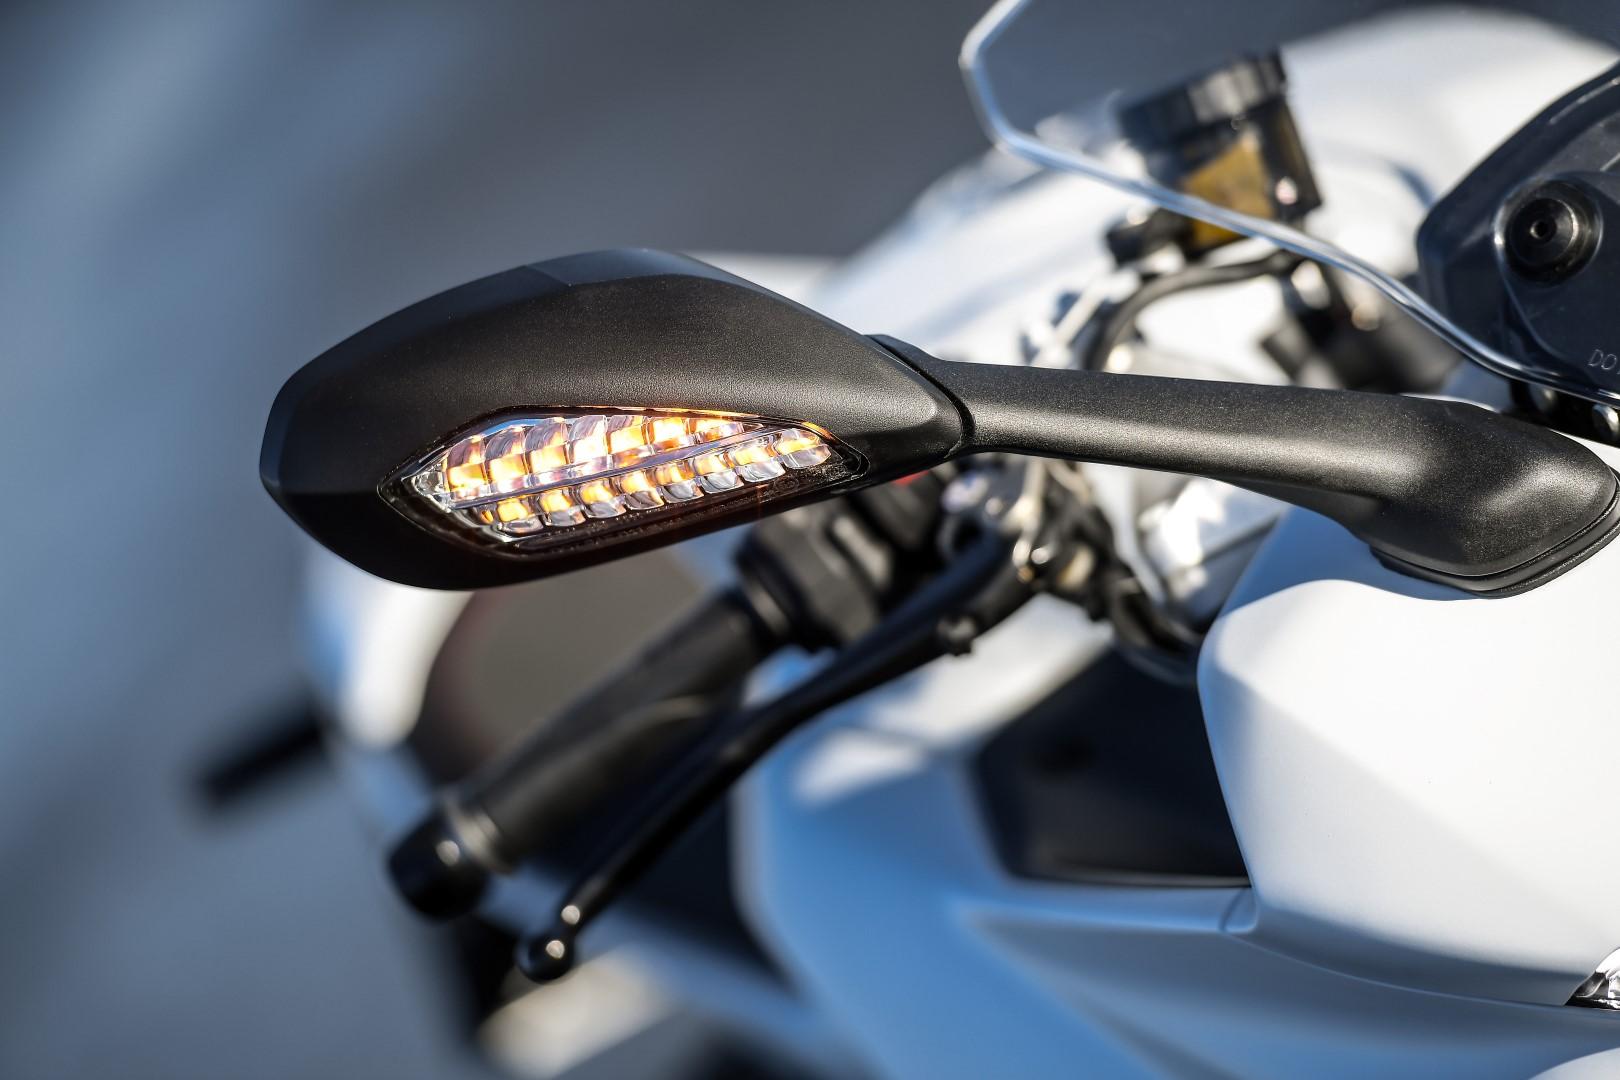 Ducati Supersport y Supersport S fotos